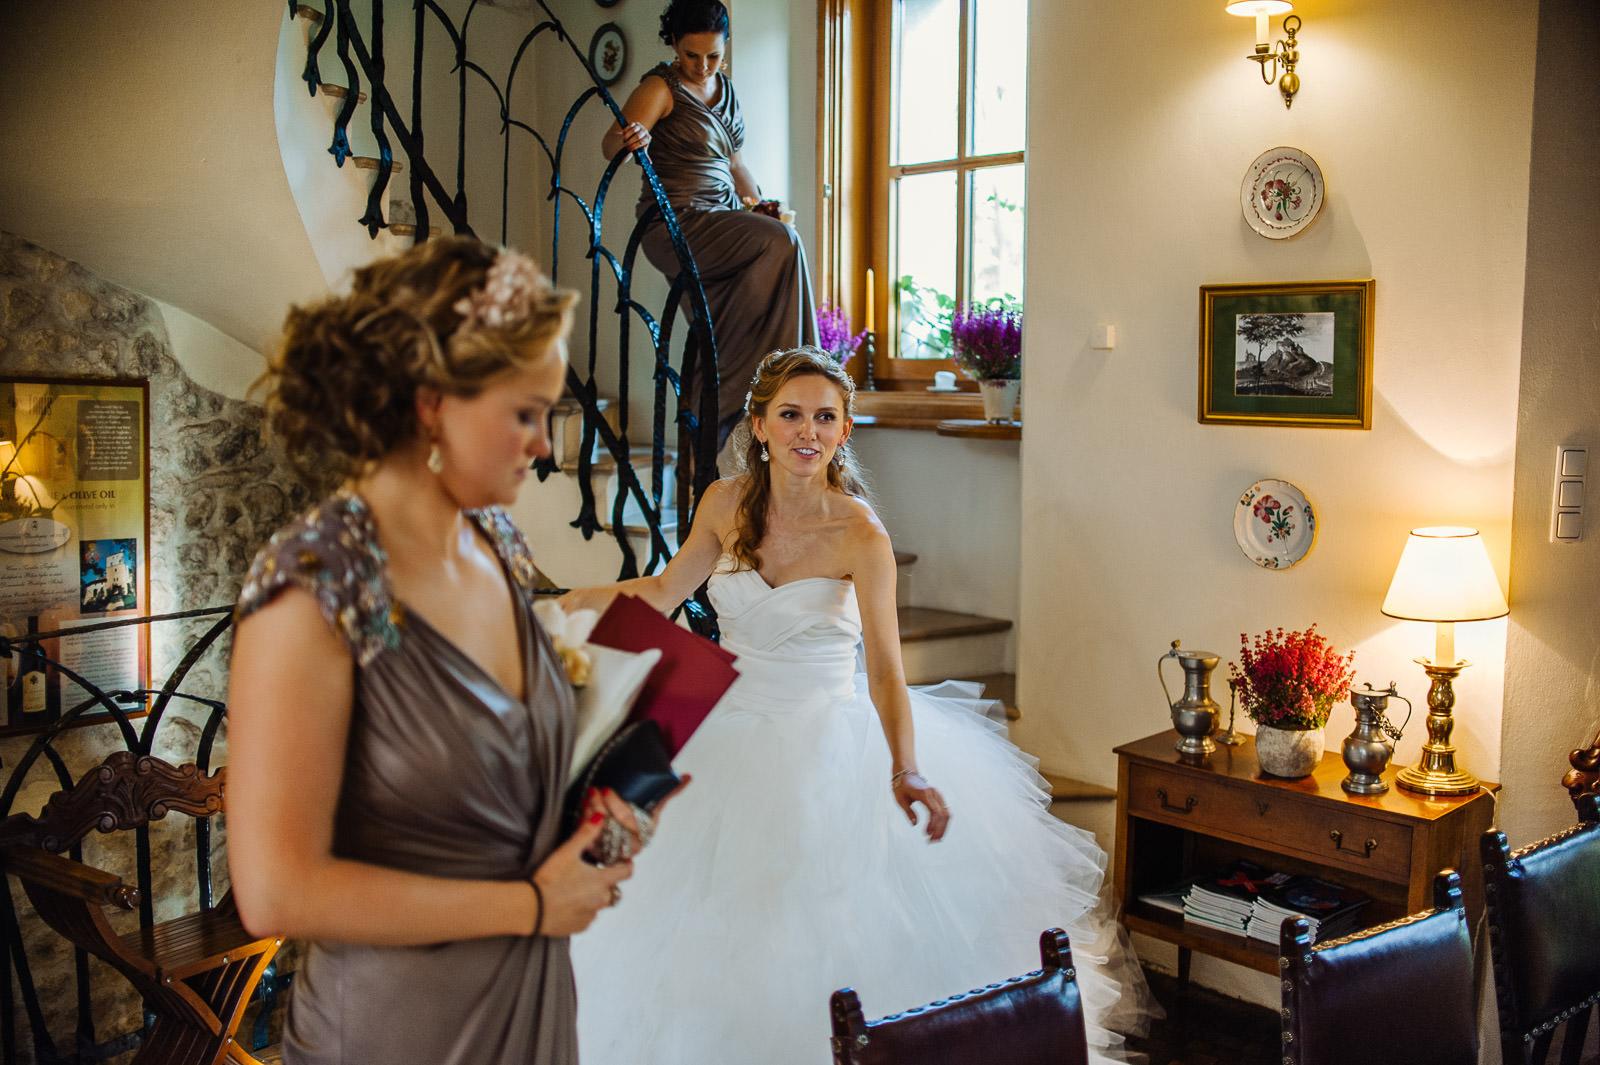 Castle Wedding Photography Korzkiew Poland 22